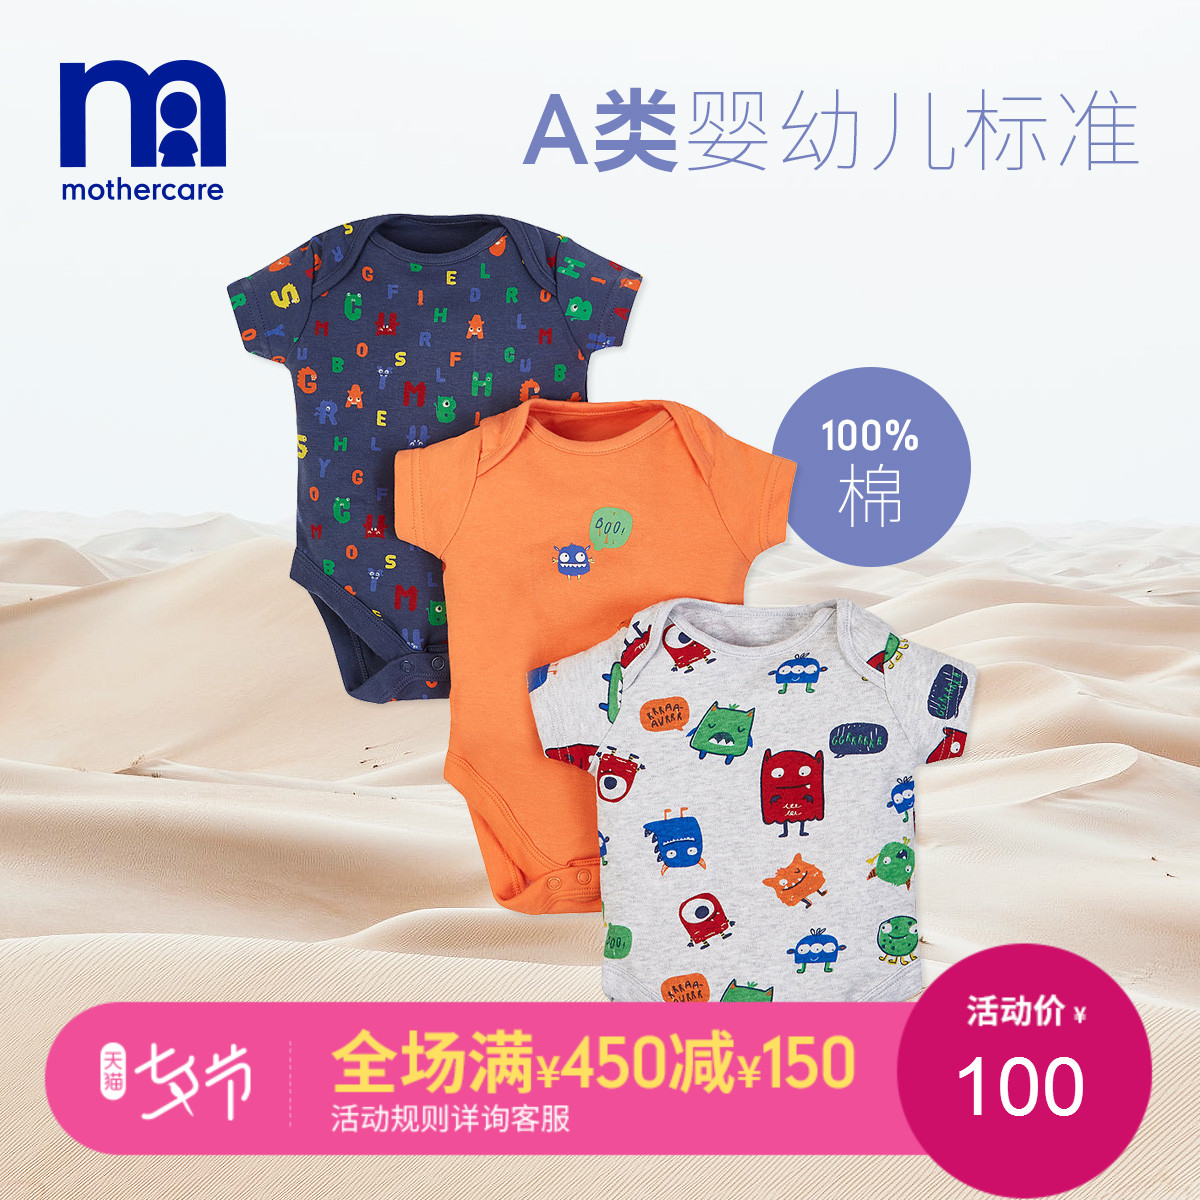 mothercare婴儿夏装男宝宝棉质短袖恶魔怪兽系列新生儿哈衣3件装